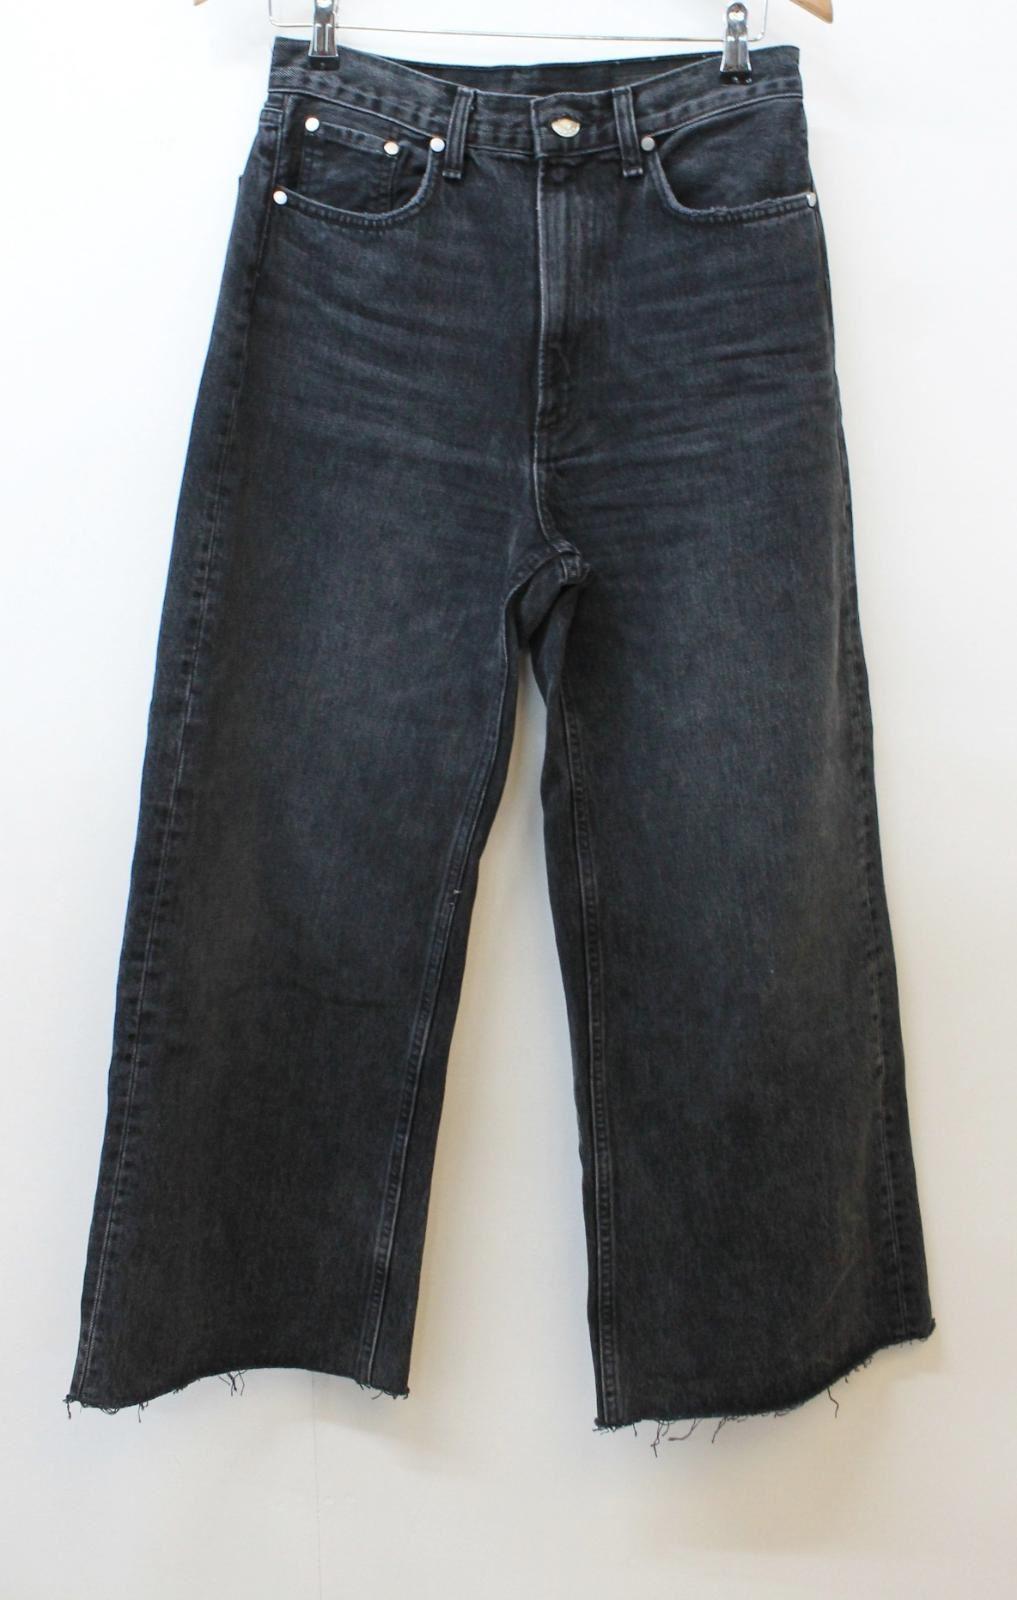 RAG & BONE NEW YORK Ladies Dark Grey Cotton Wide Leg Loose Jeans W27 L27